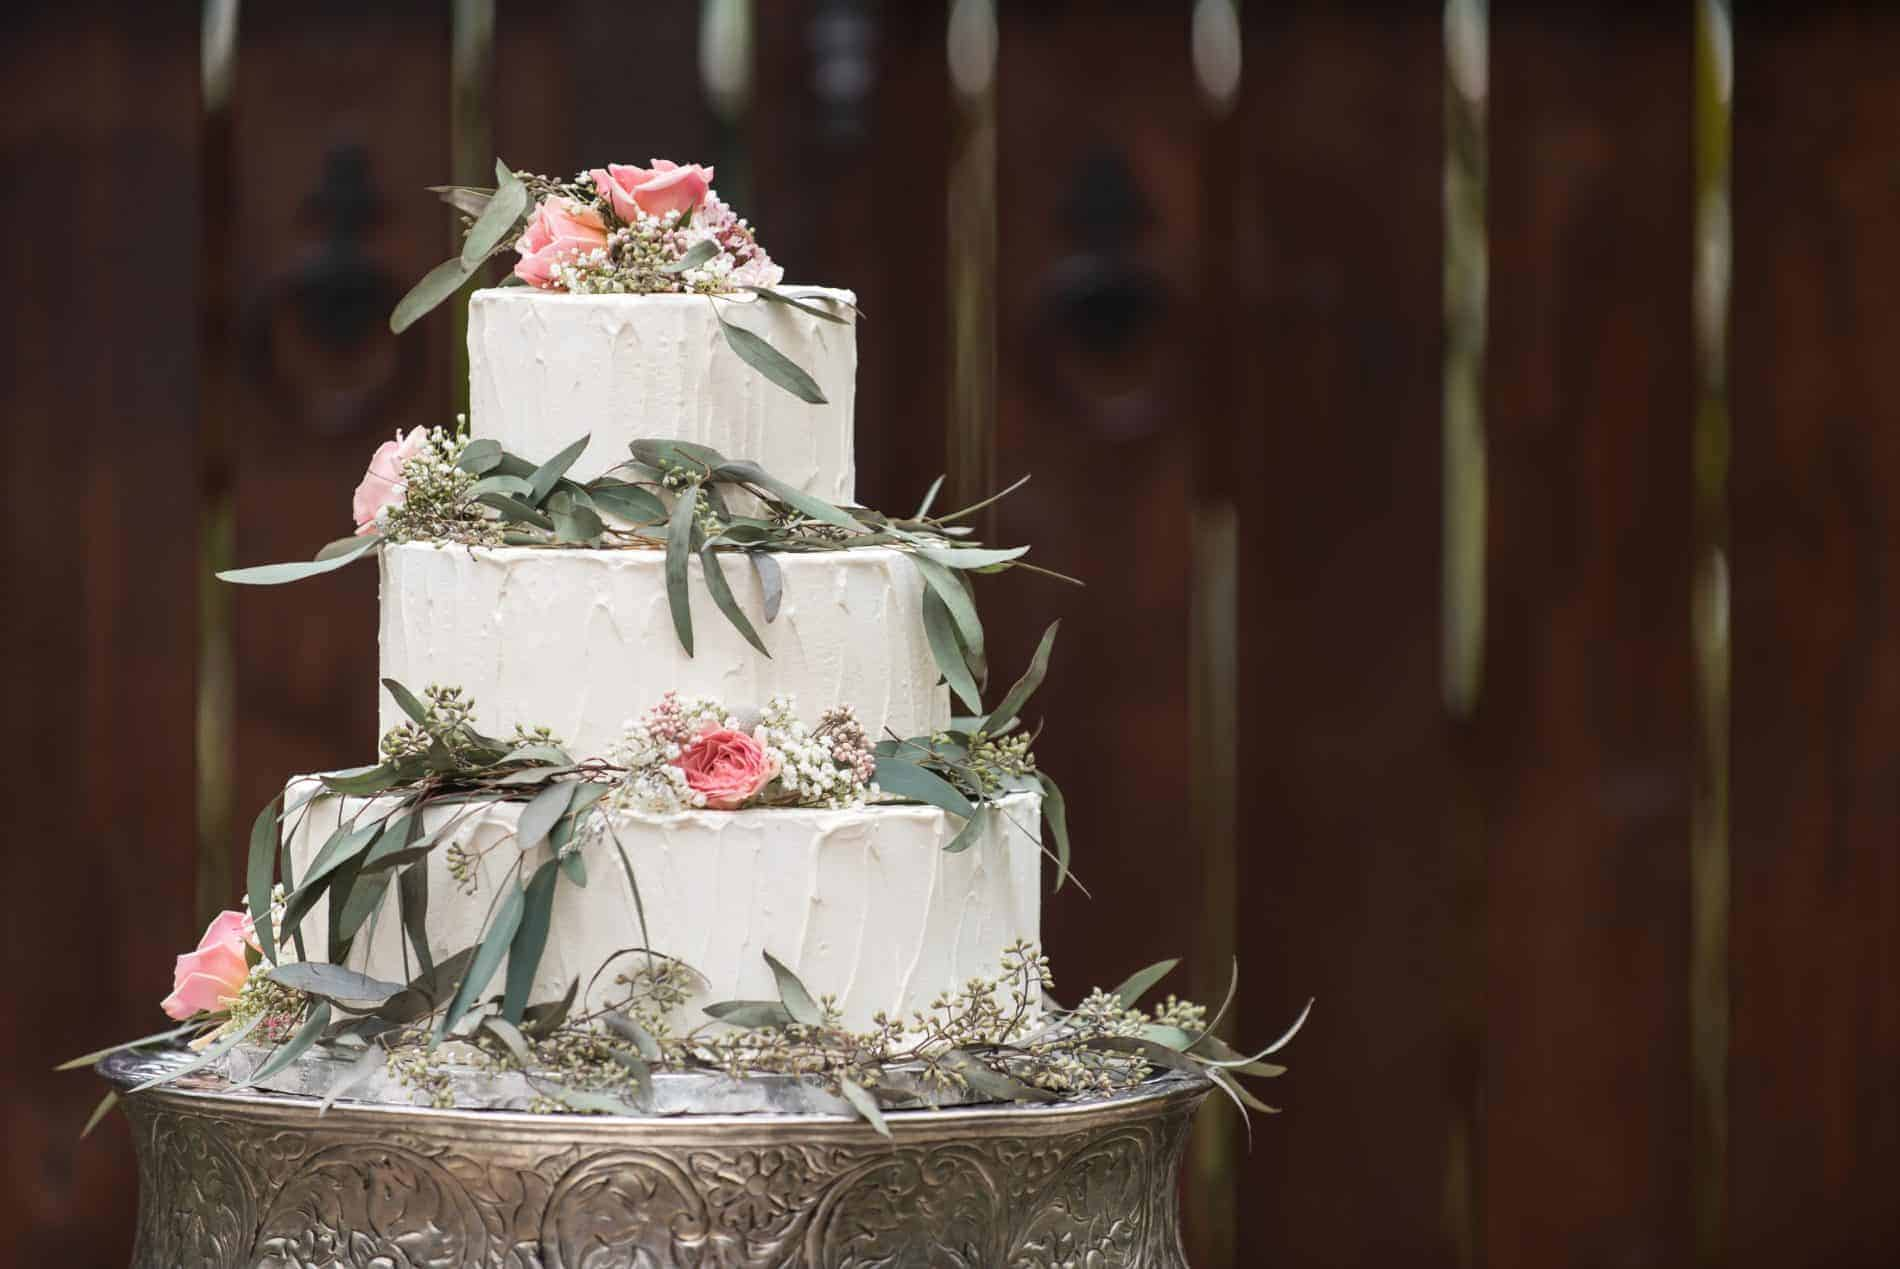 Cake Designers Coordinated this Amazing Wedding Cake